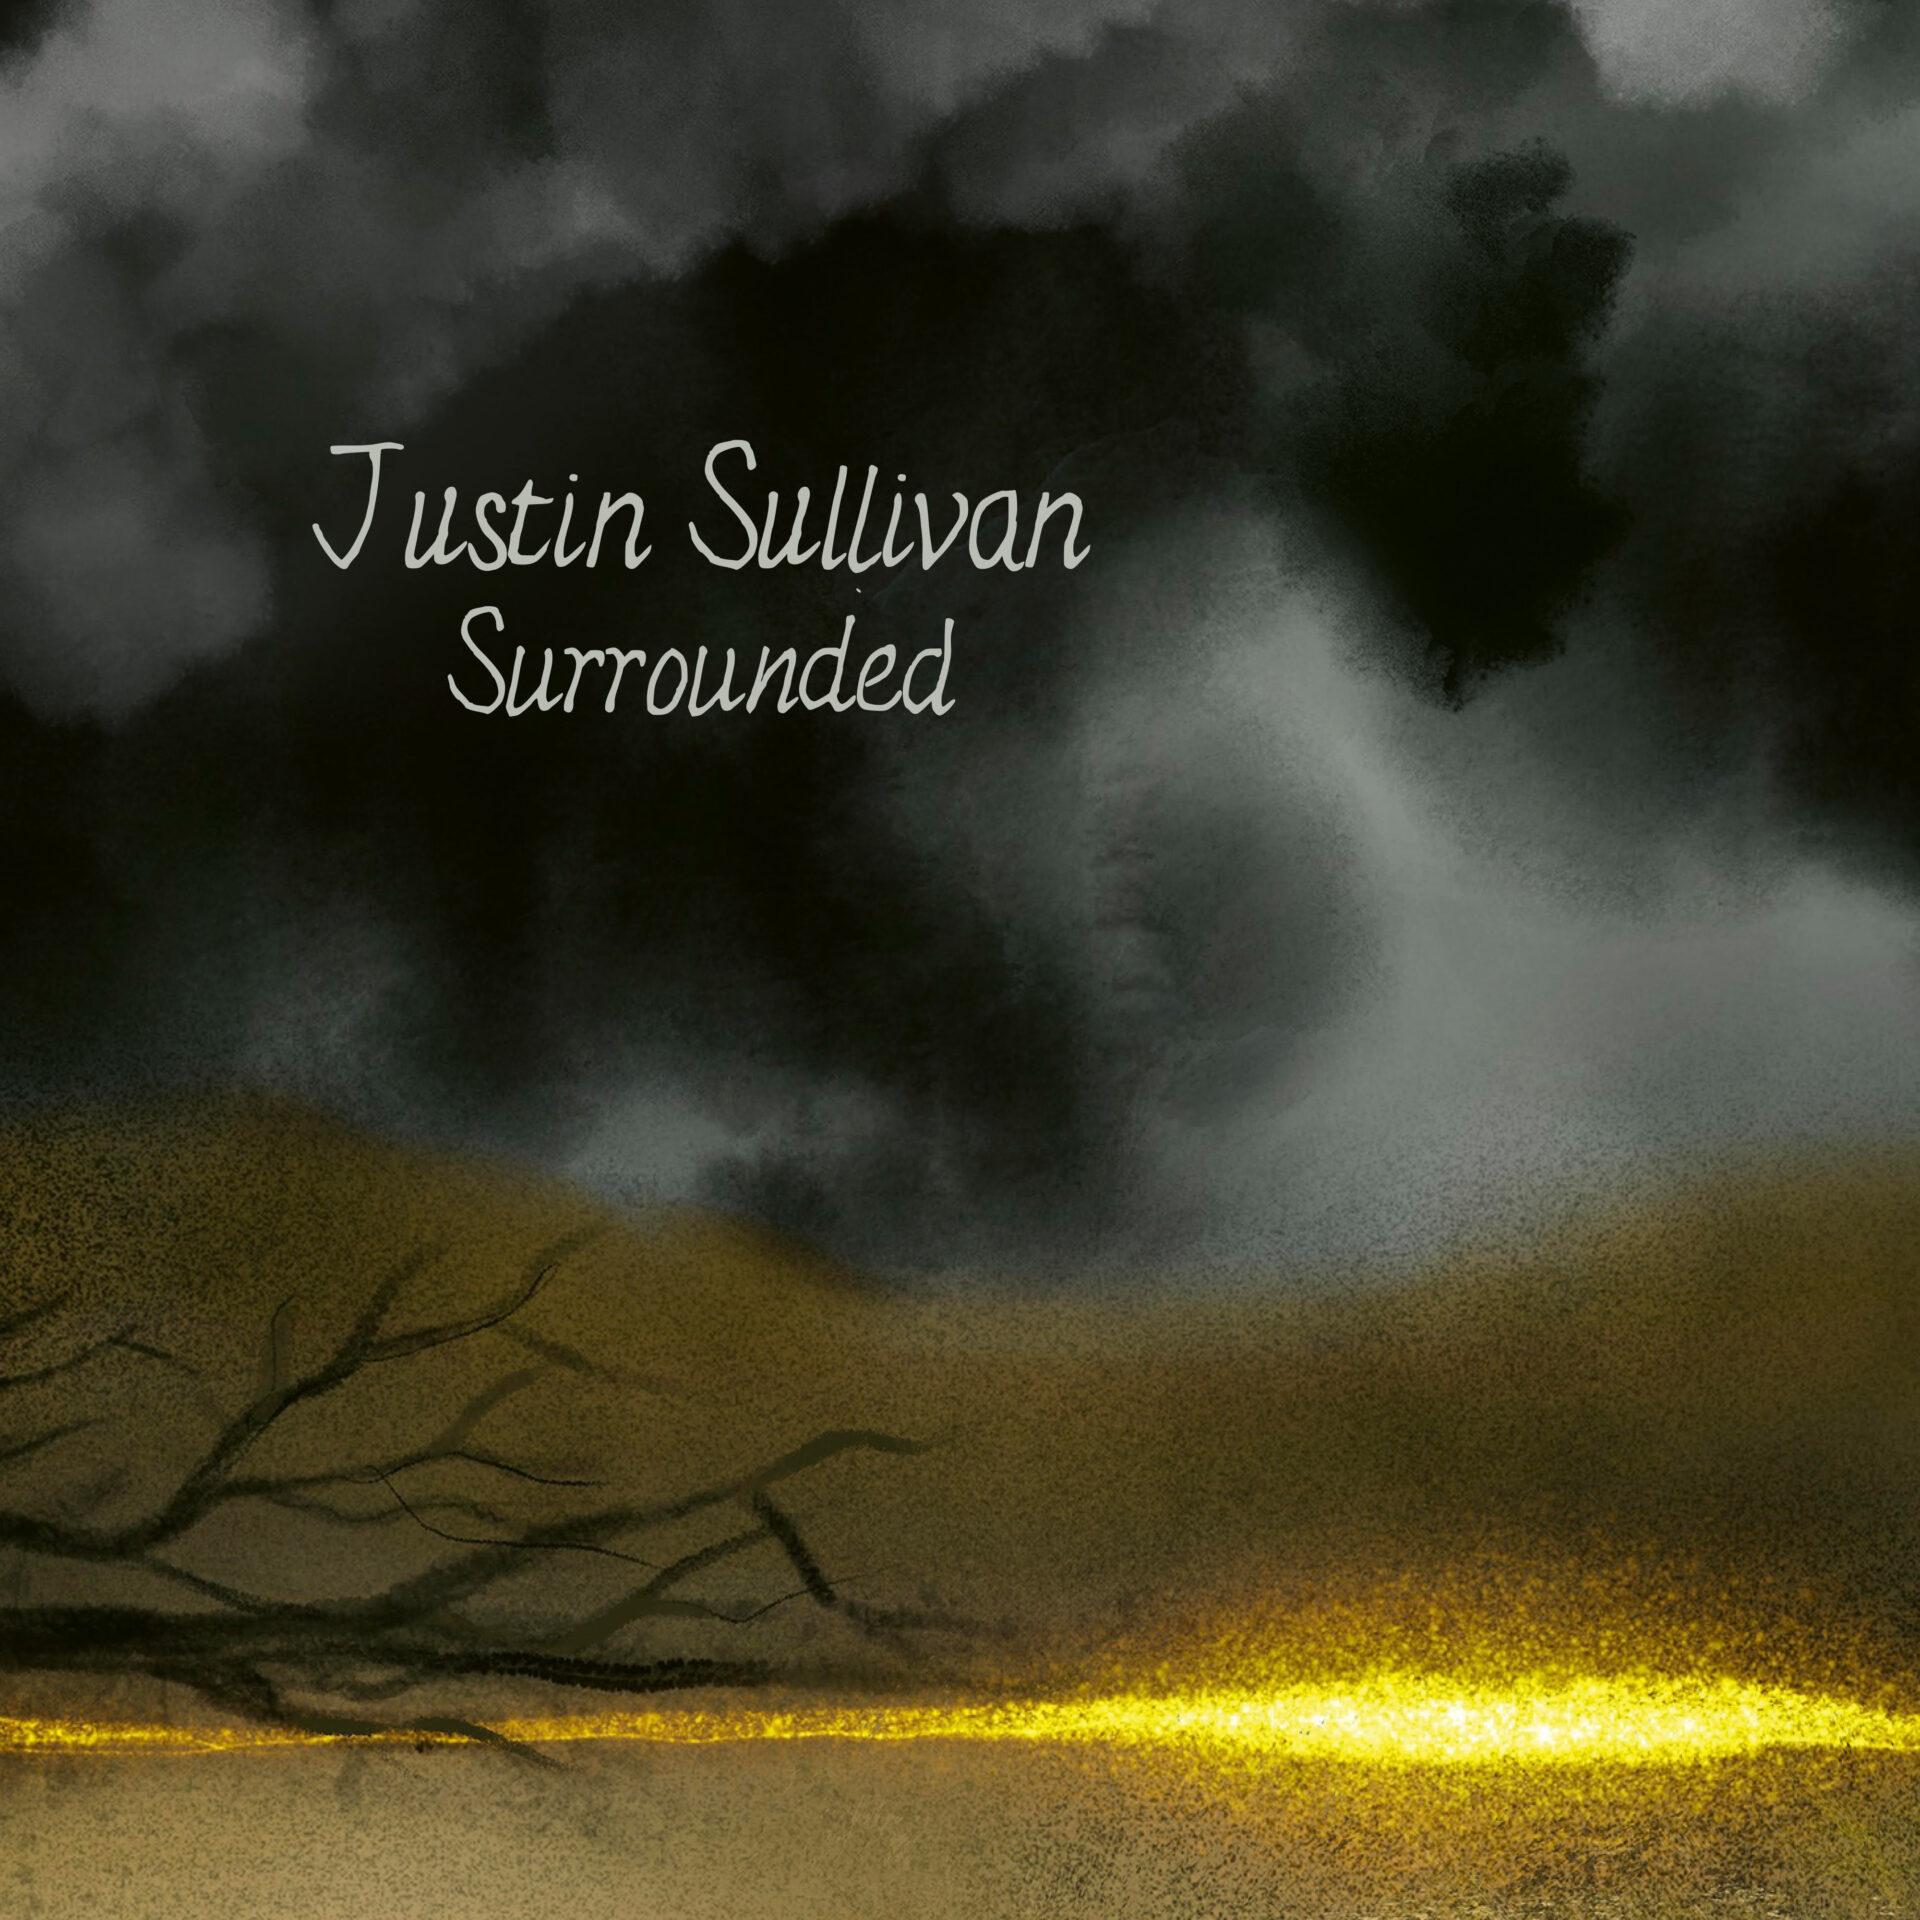 NEWS: Justin Sullivan announces second solo album and unveils first track